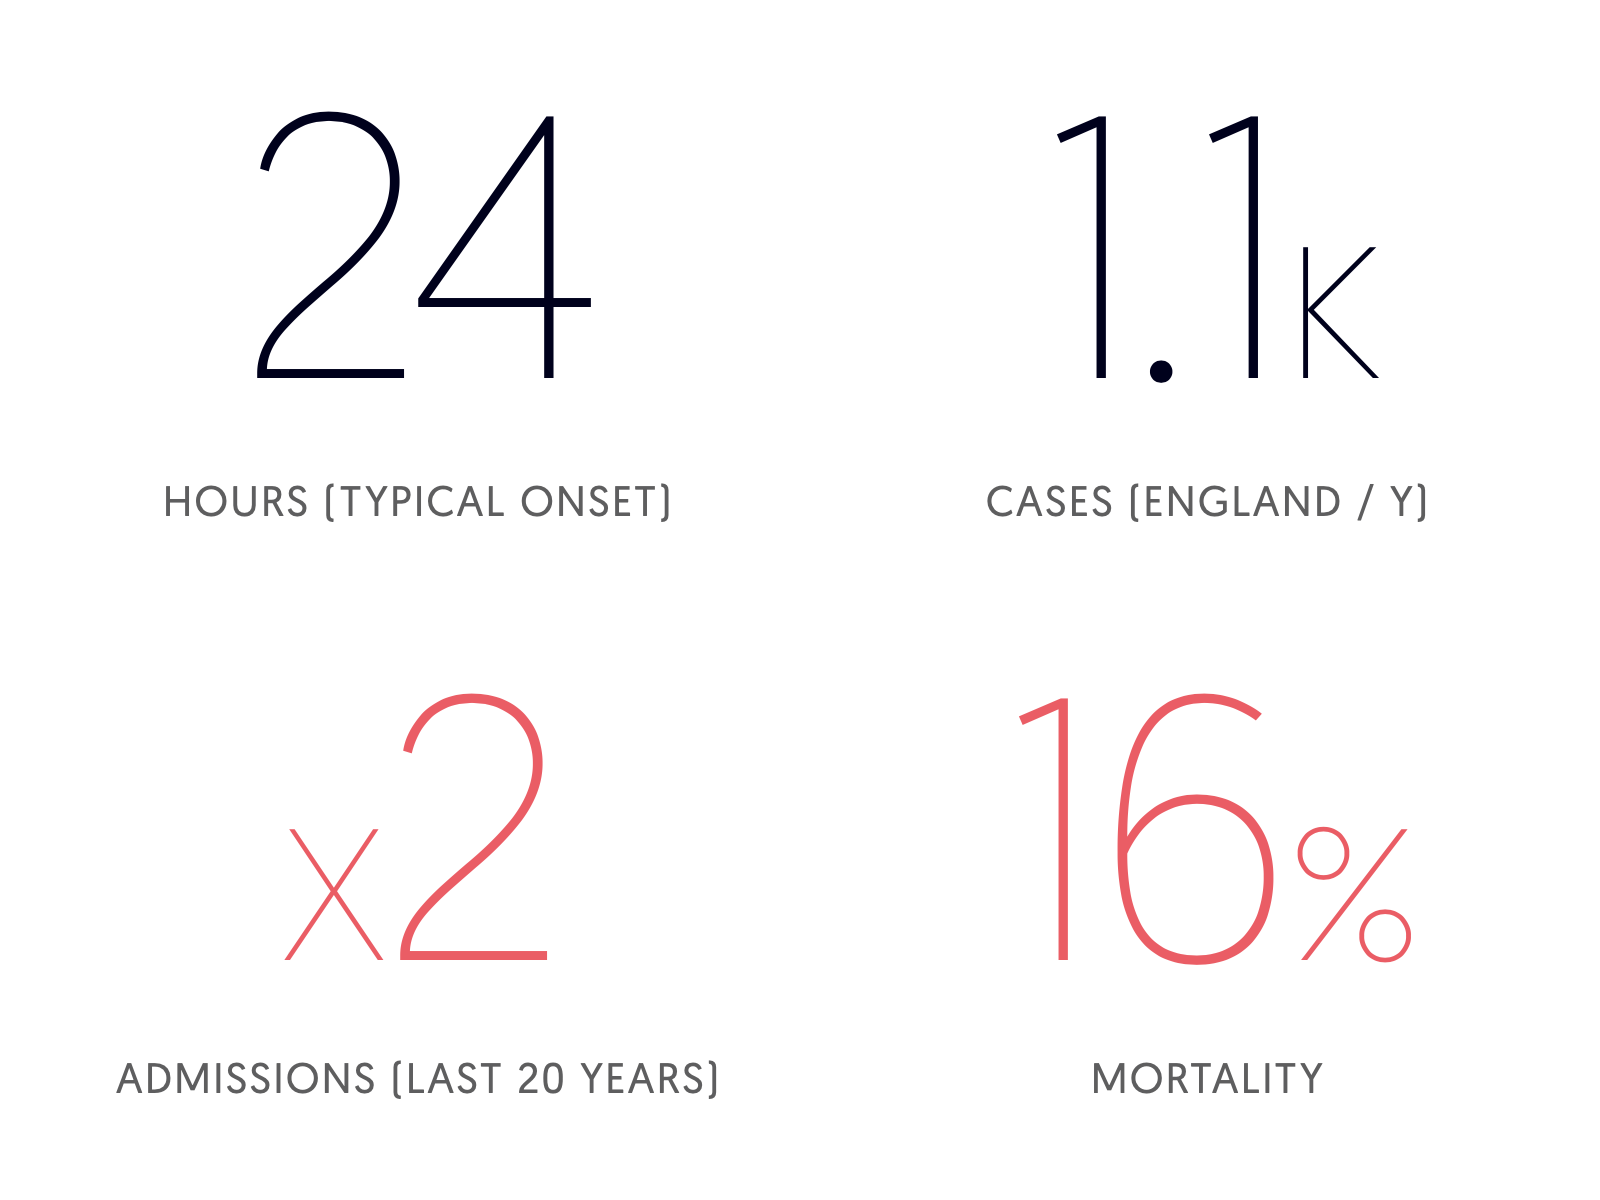 NSTI statistics